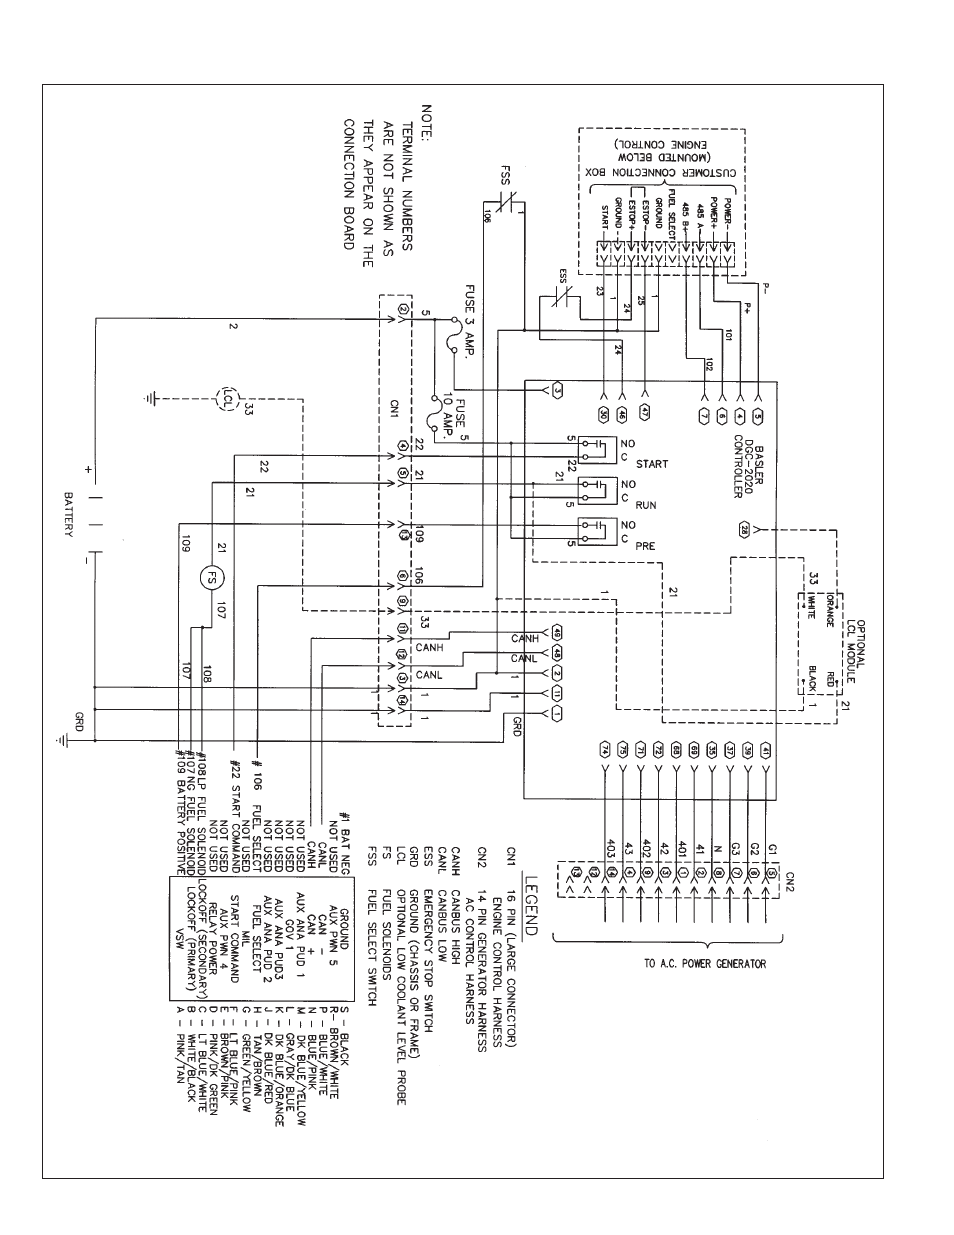 basler generator wiring diagram best wiring librarybasler generator wiring diagram